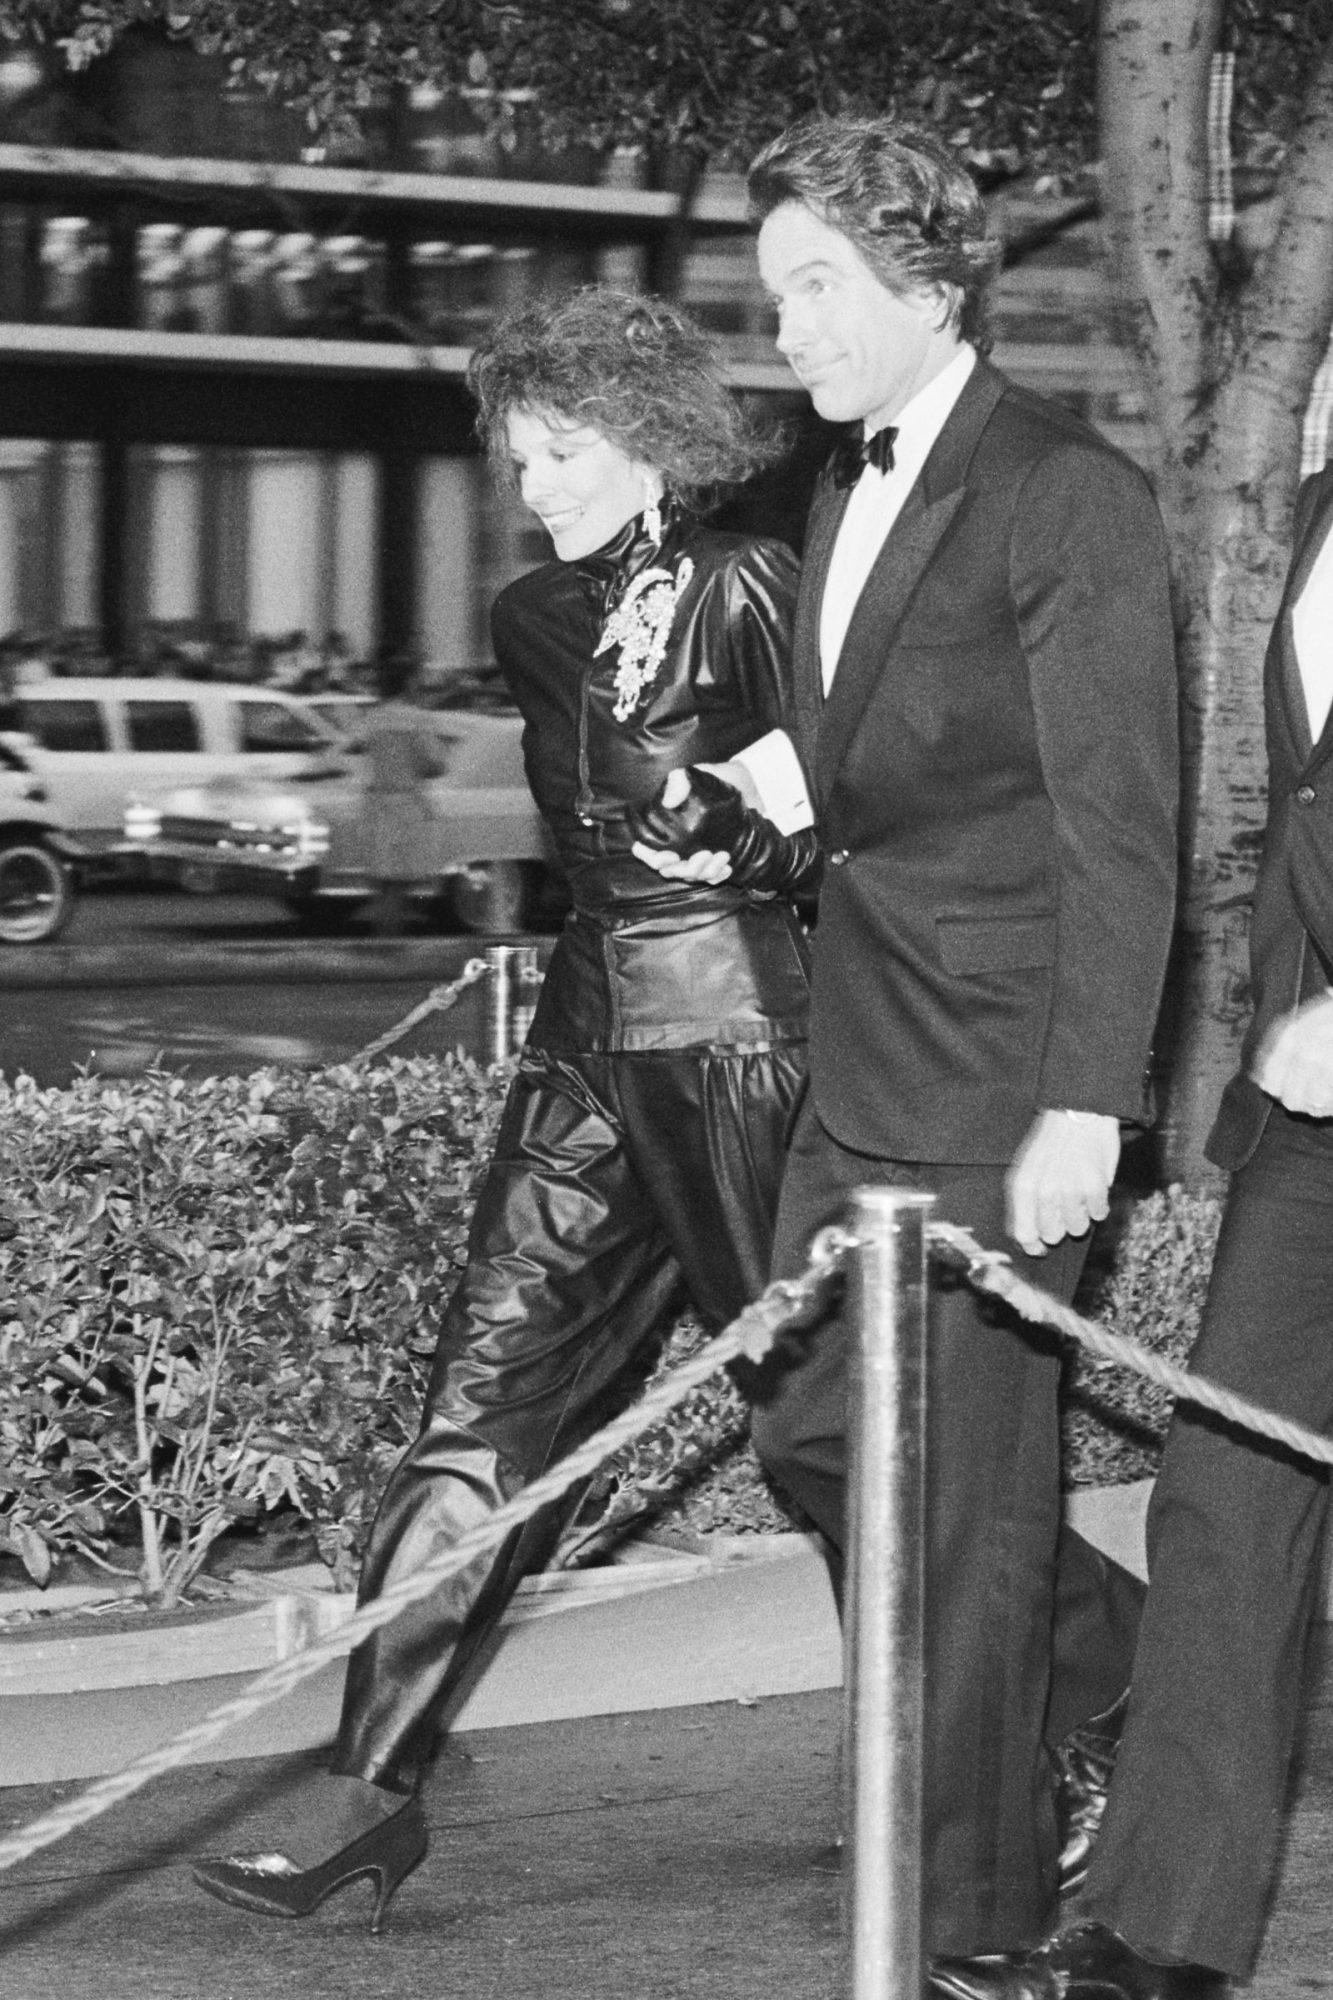 Diane Keaton and Warren Beatty Arriving